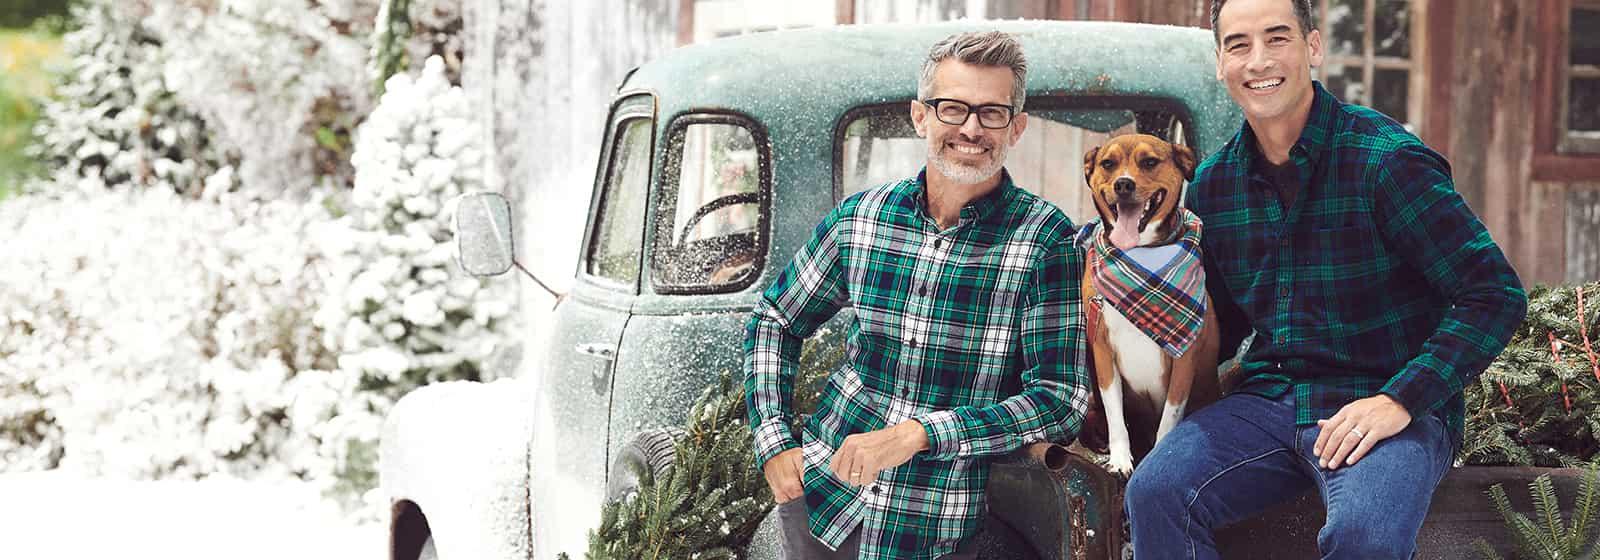 Men's Fall Flannel Shirts: A Season Staple